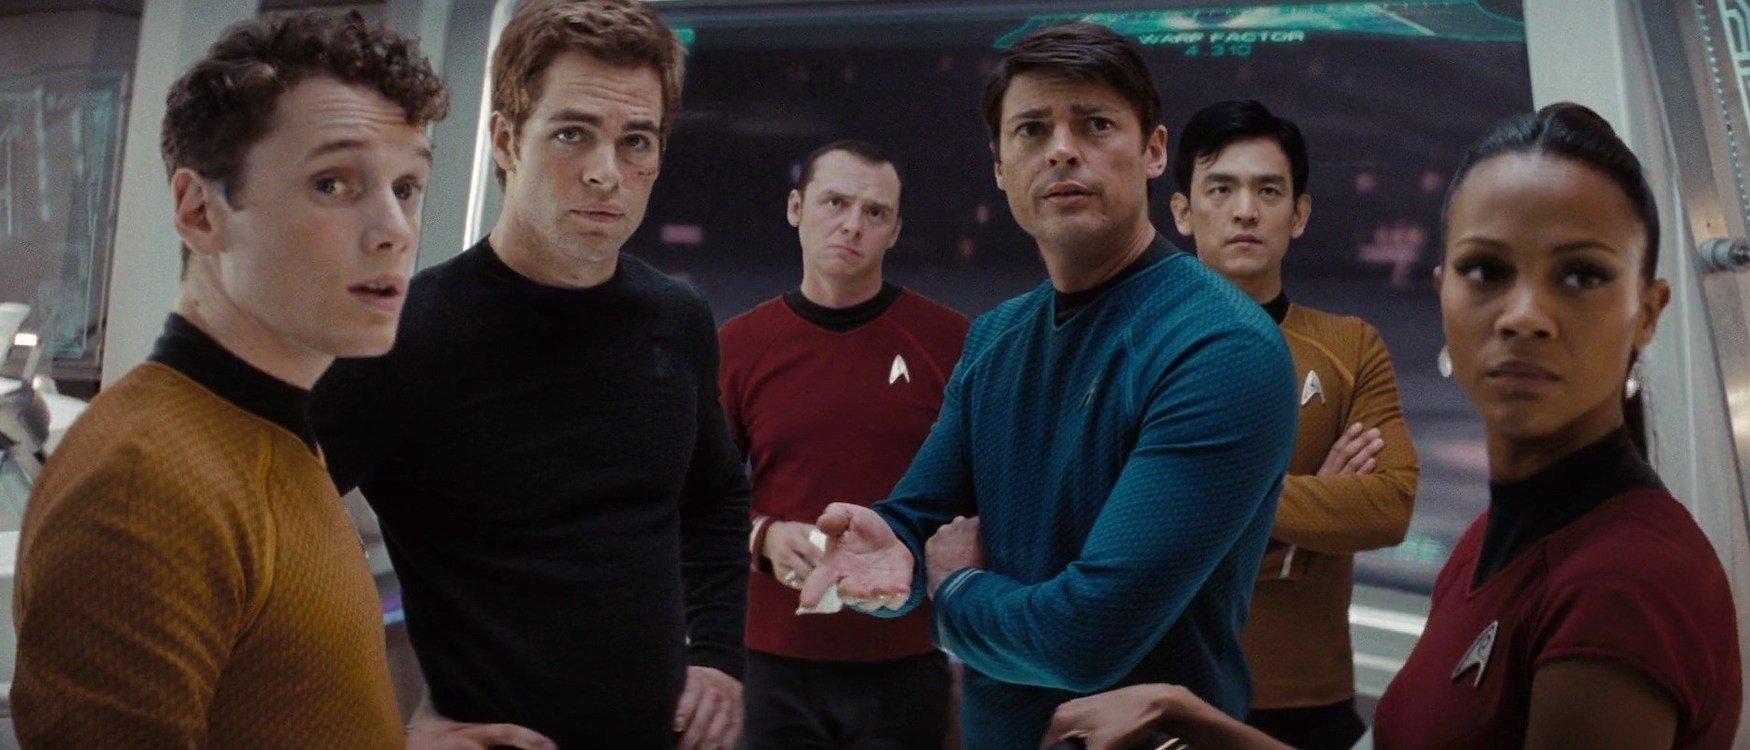 A still shot from 'Star Trek' by J.J. Abrams.